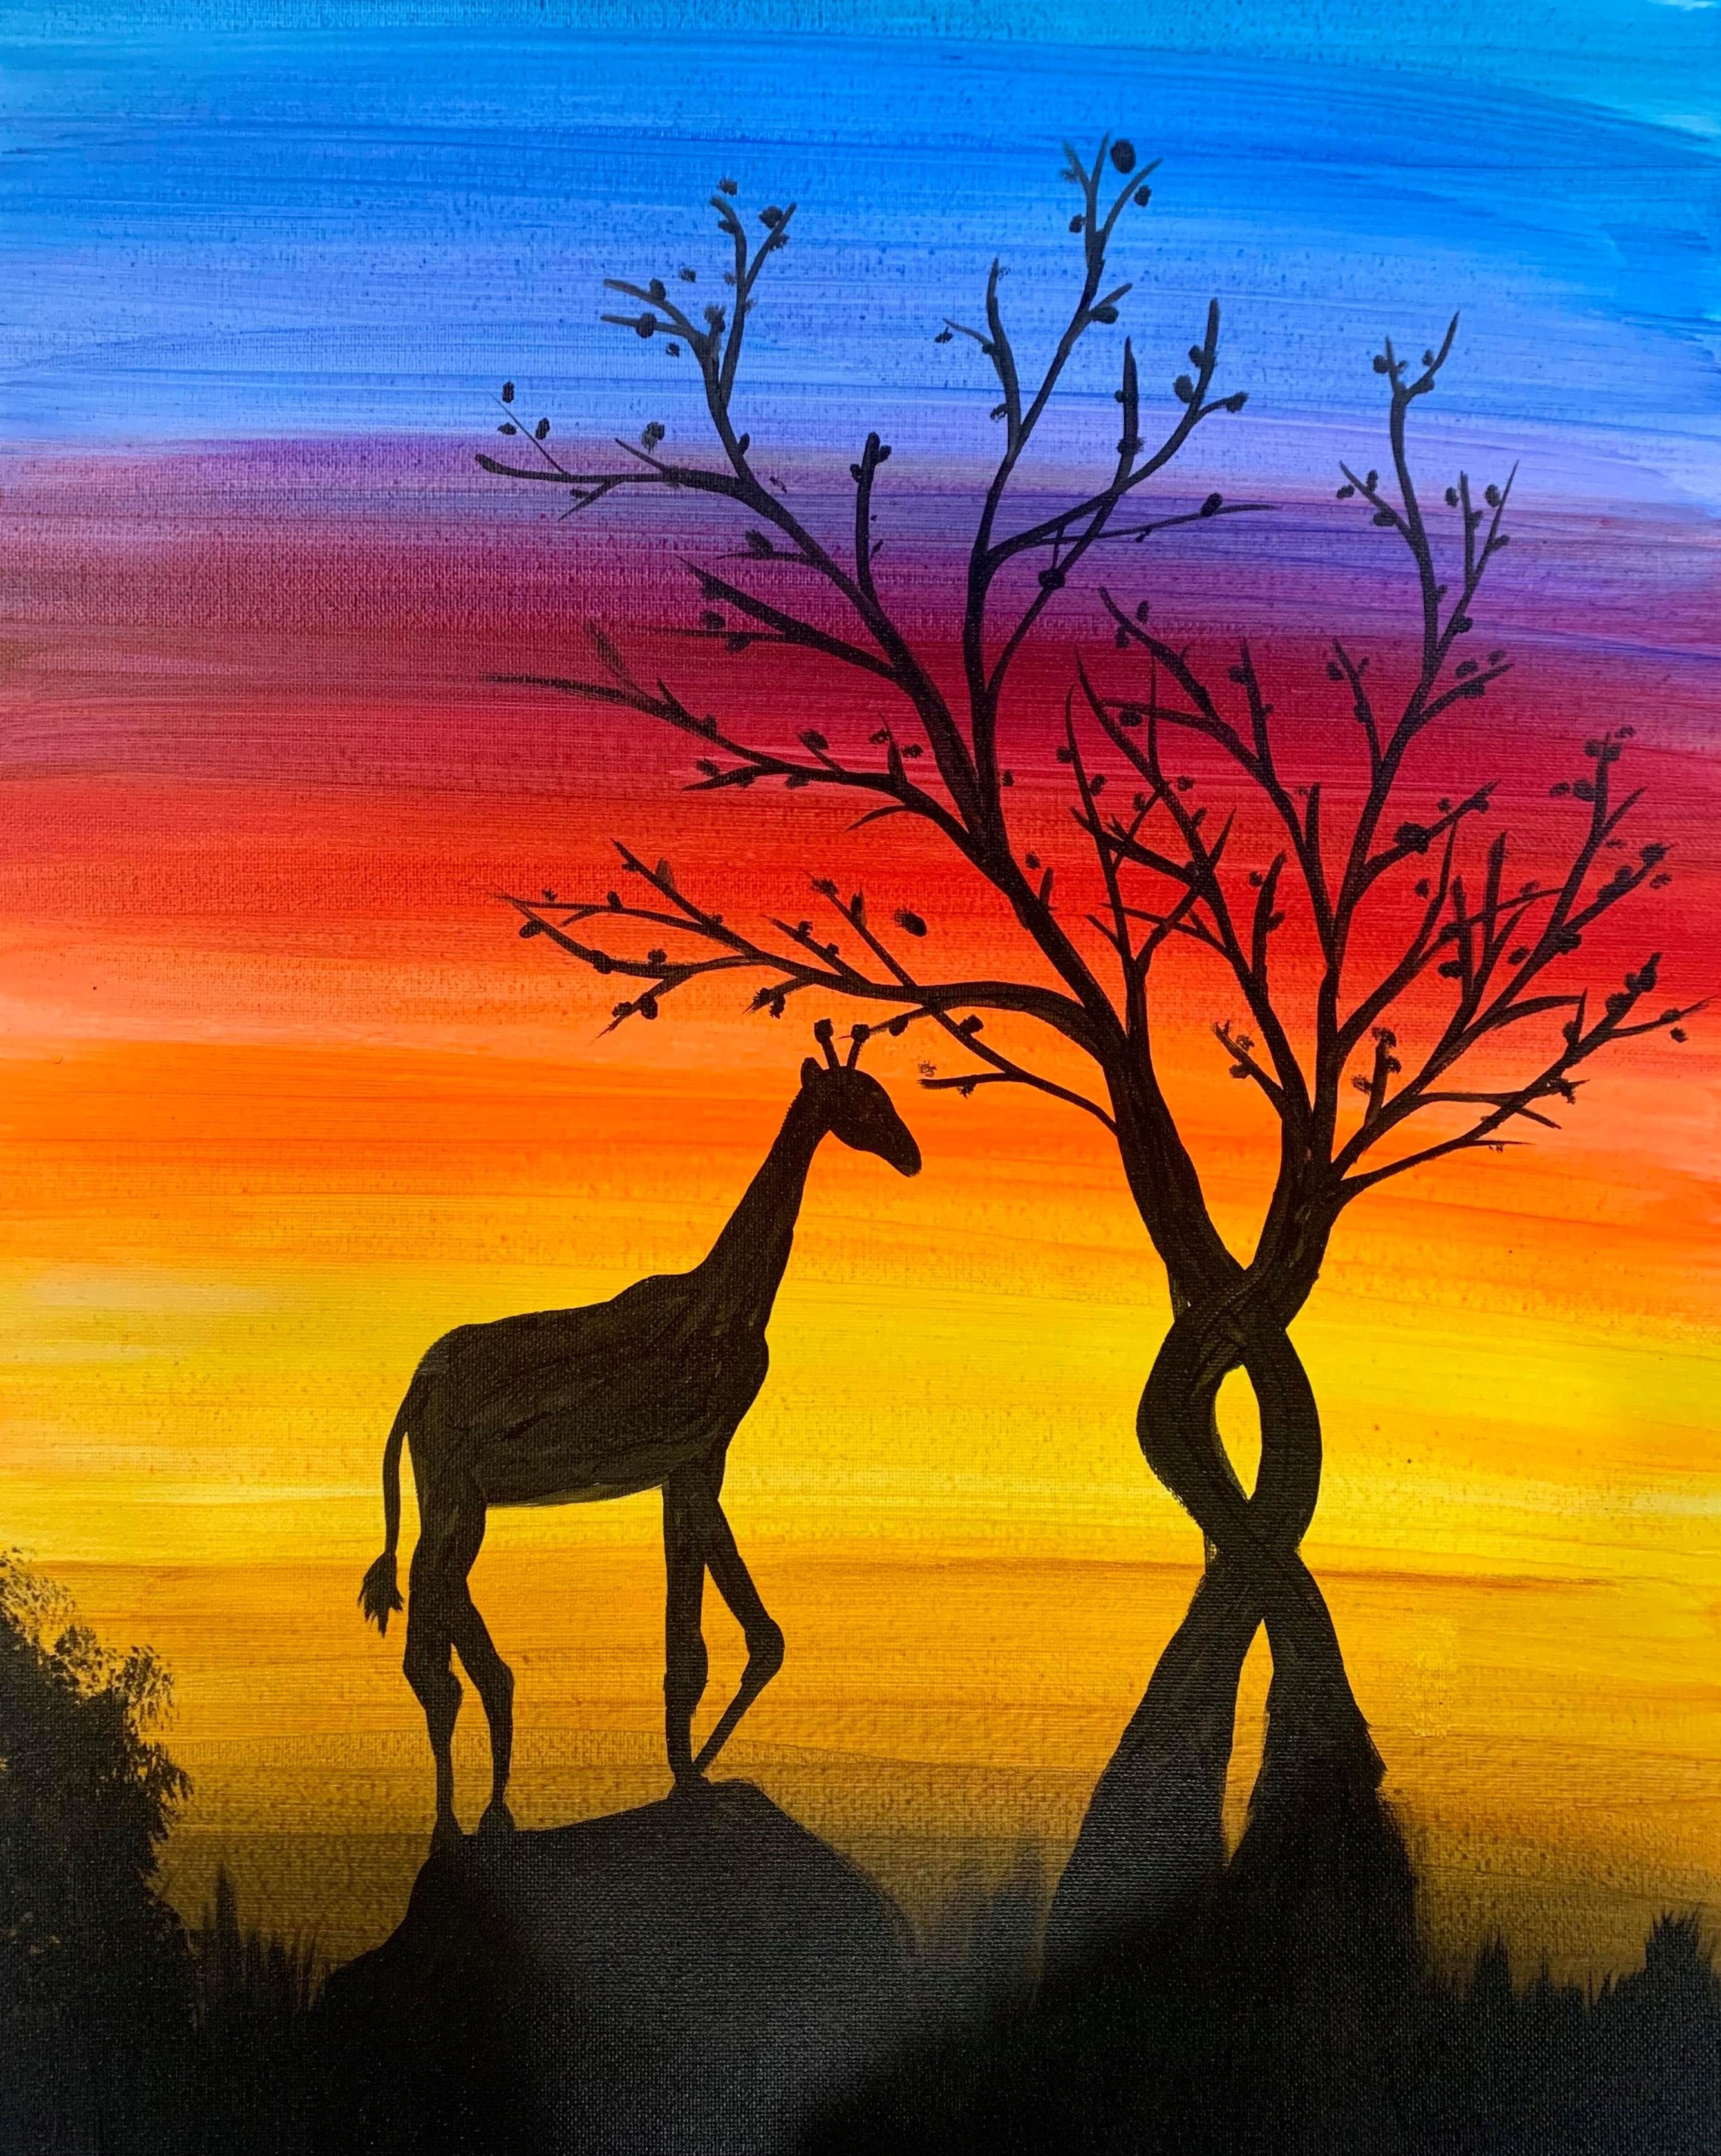 Savannah Giraffe